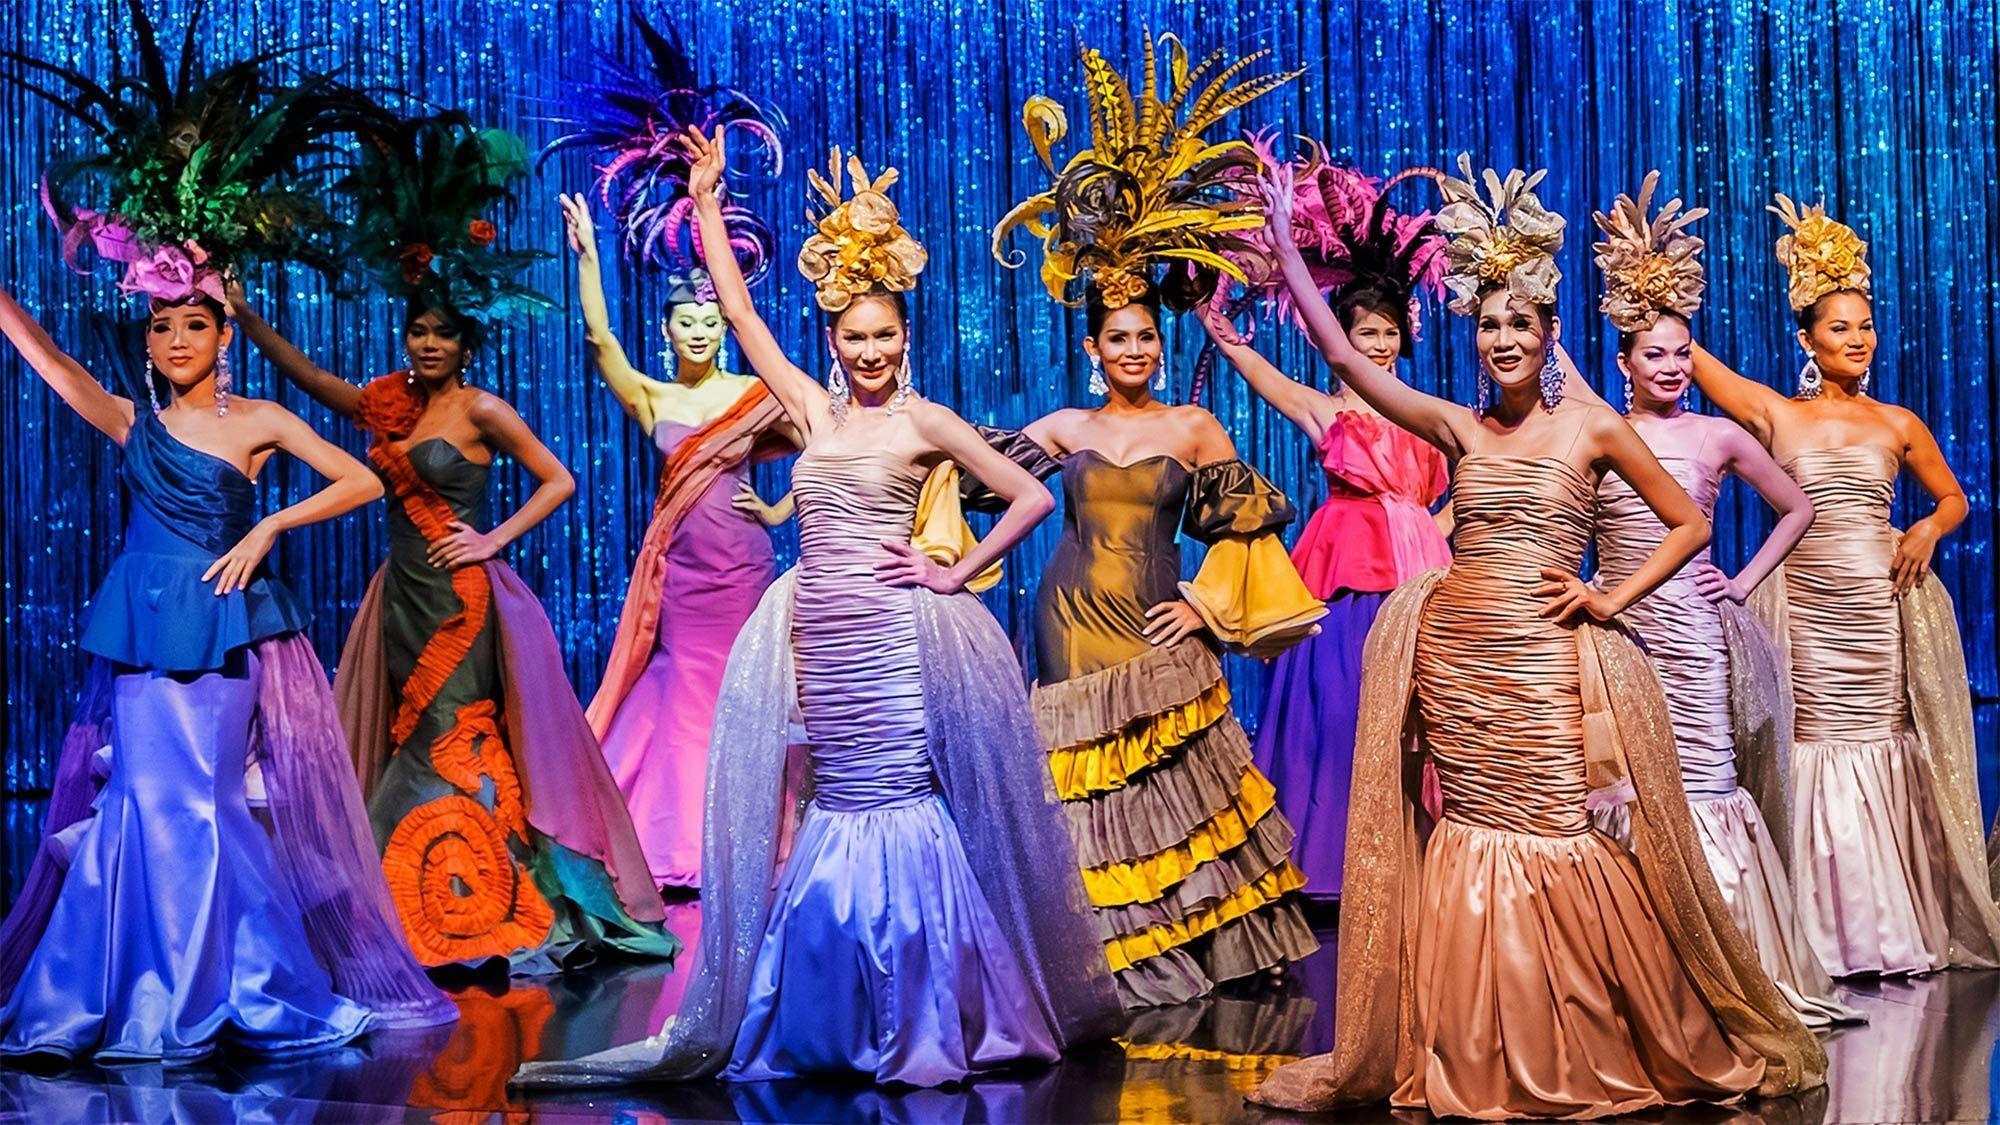 Calypso Bangkok Cabaret Show in Bangkok, Thailand